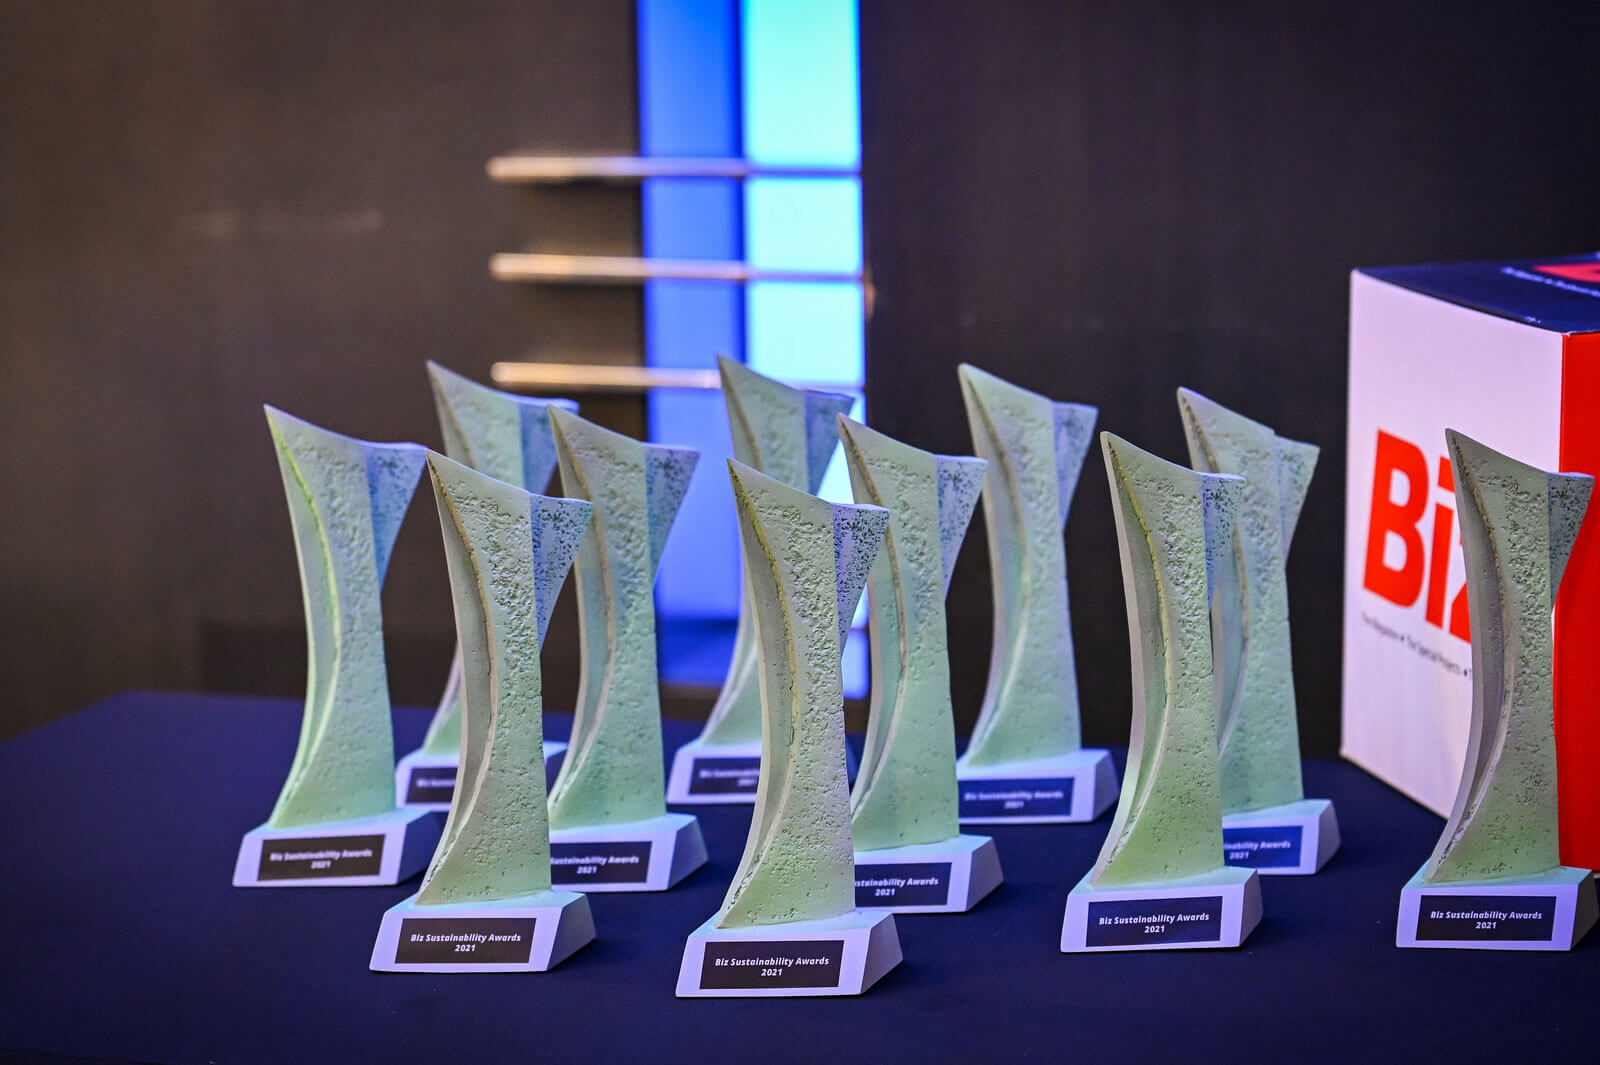 Winners of the Biz Sustainability Awards 2021